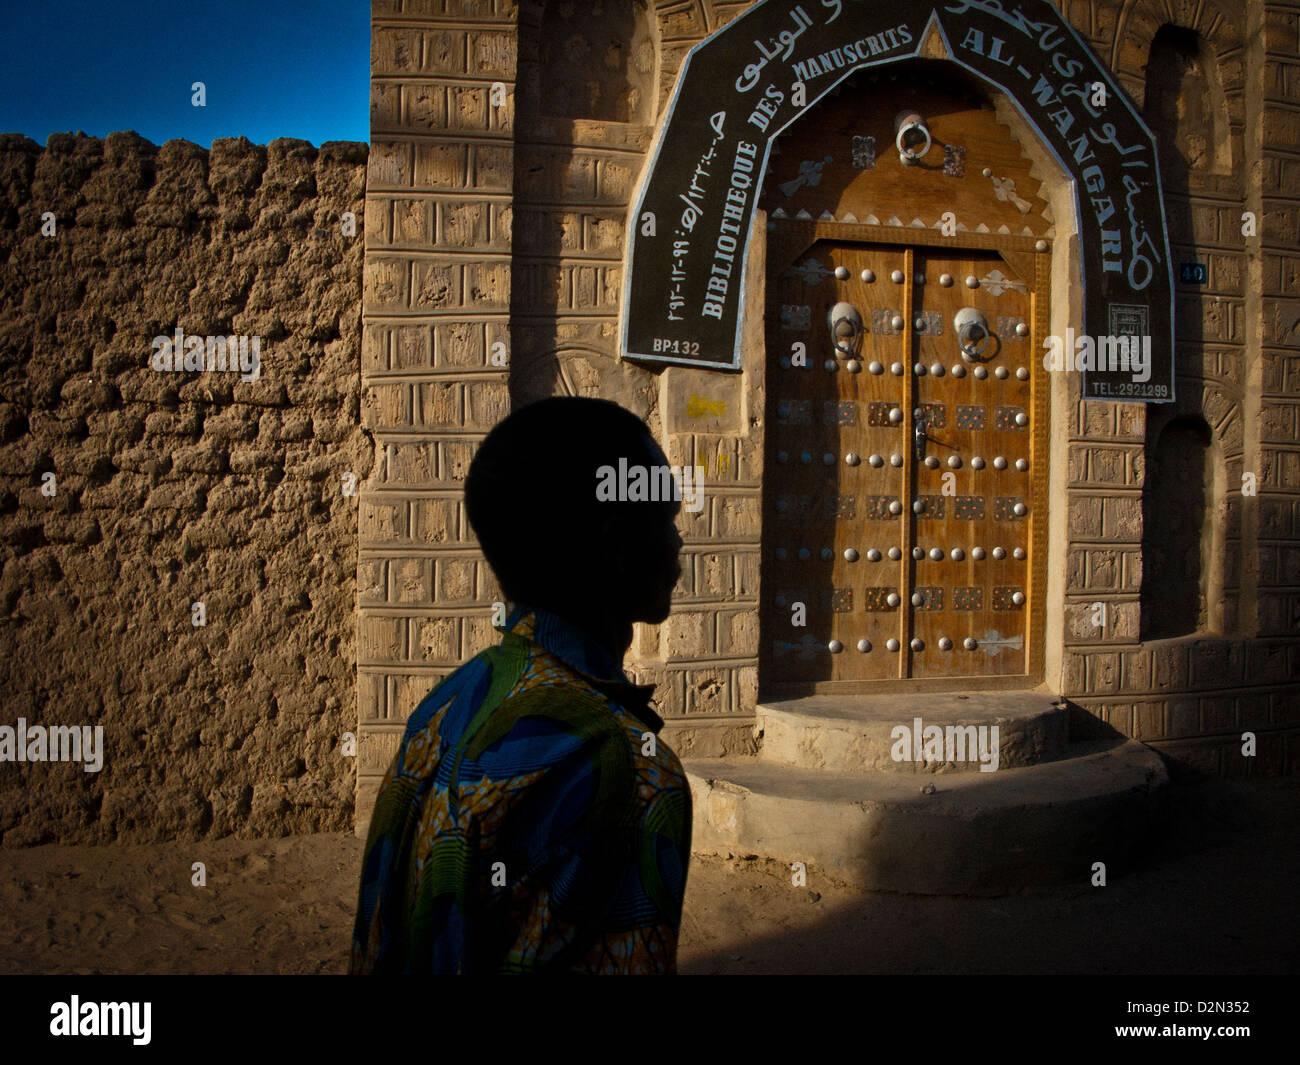 Bibliotheque des Manuscripts Al - Wangari.Timbuktu. Mali. - Stock Image